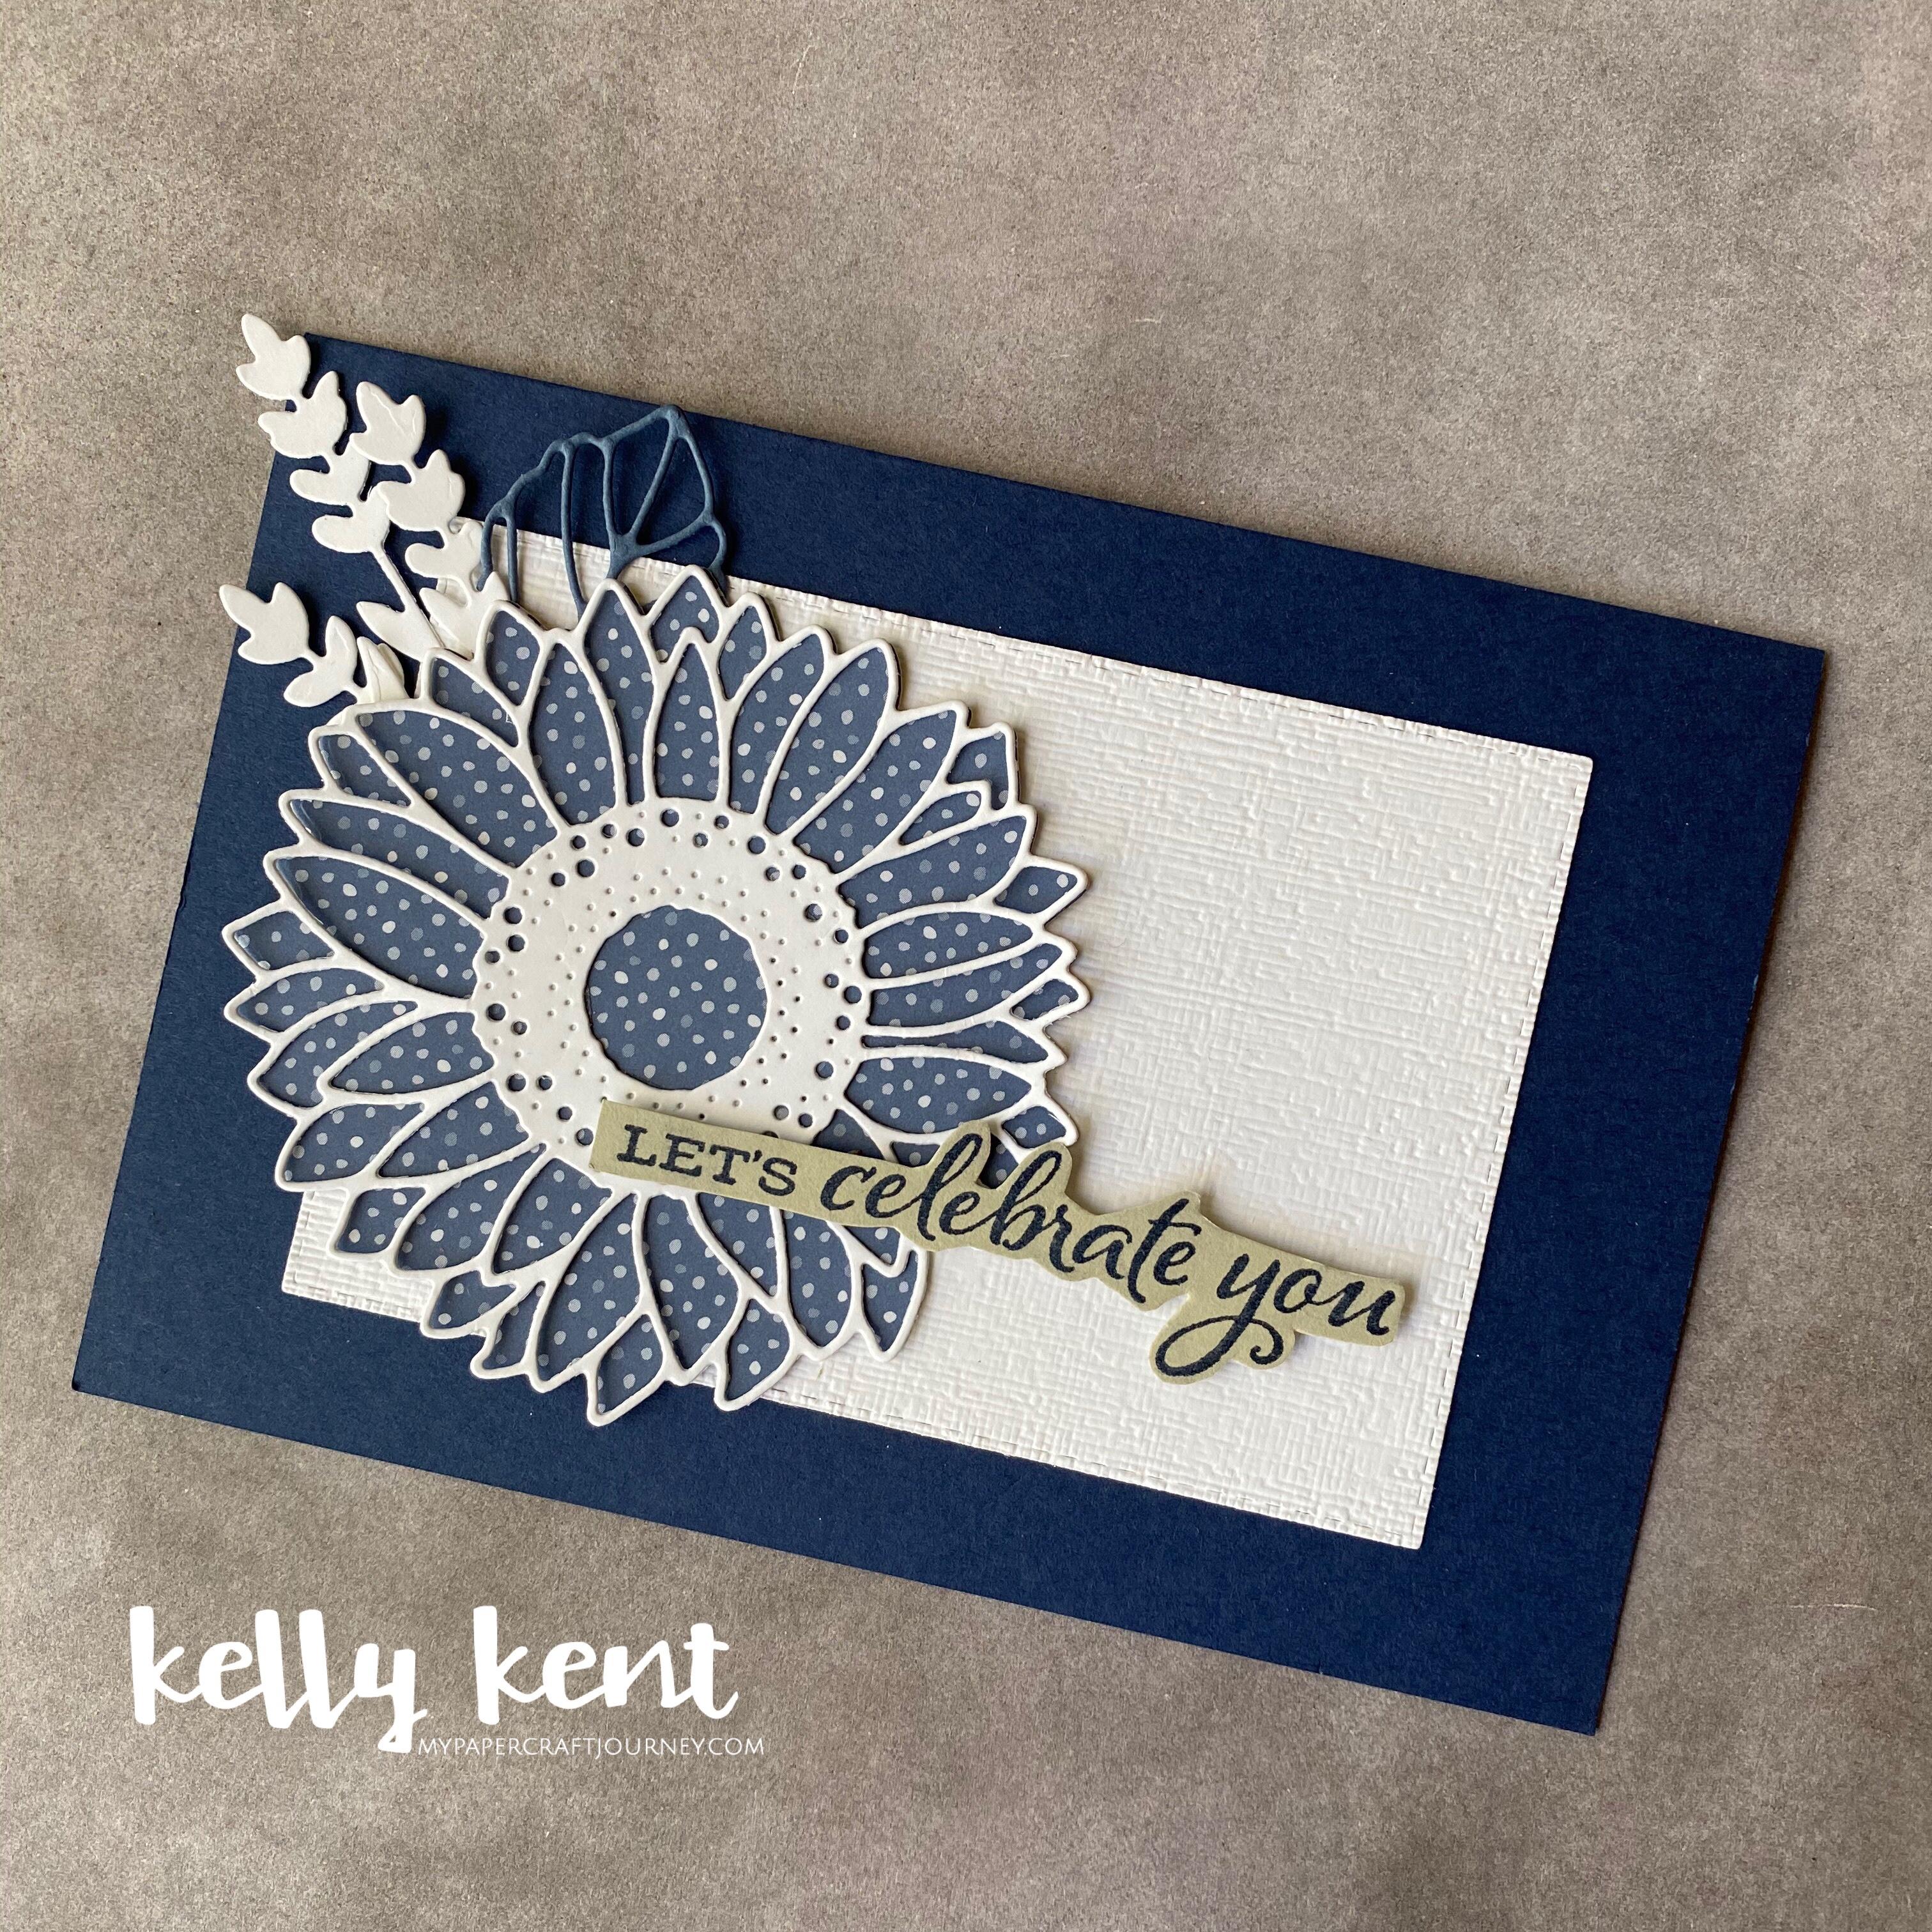 Celebrate Sunflowers | kelly kent